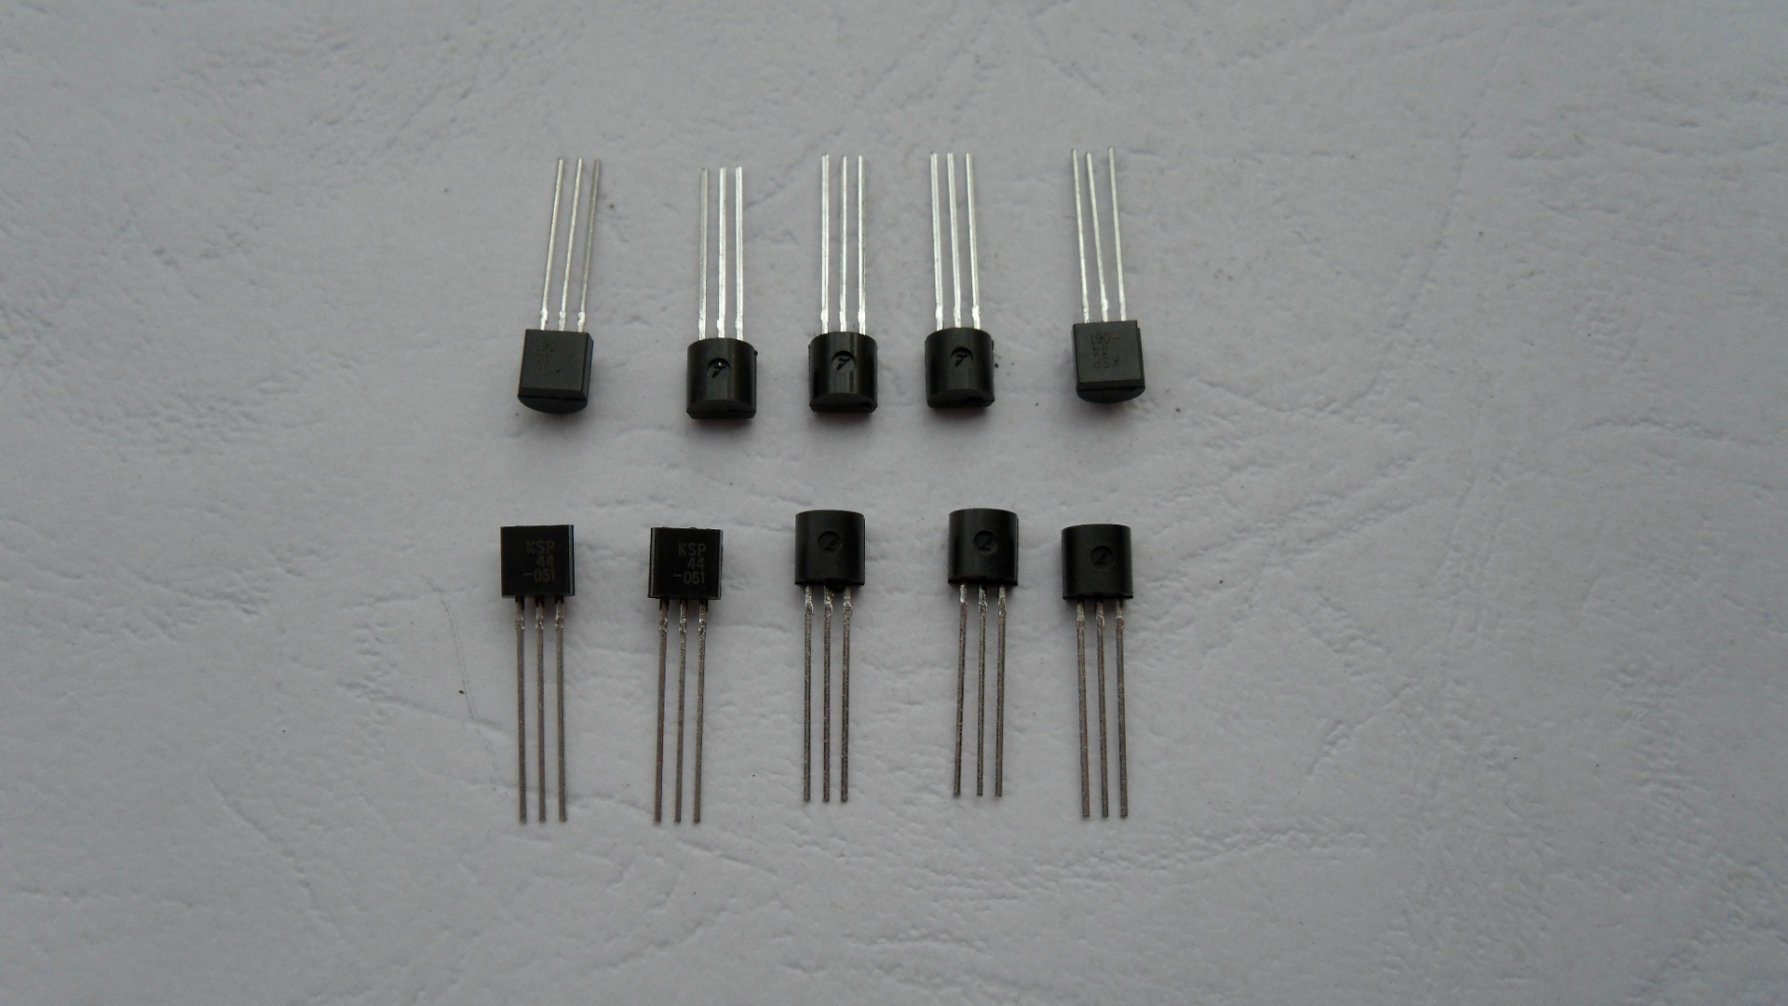 Электрооборудование A42 mpsA42 NPN TO92 120 ht7333 ht7333 a ht7333 1 to92